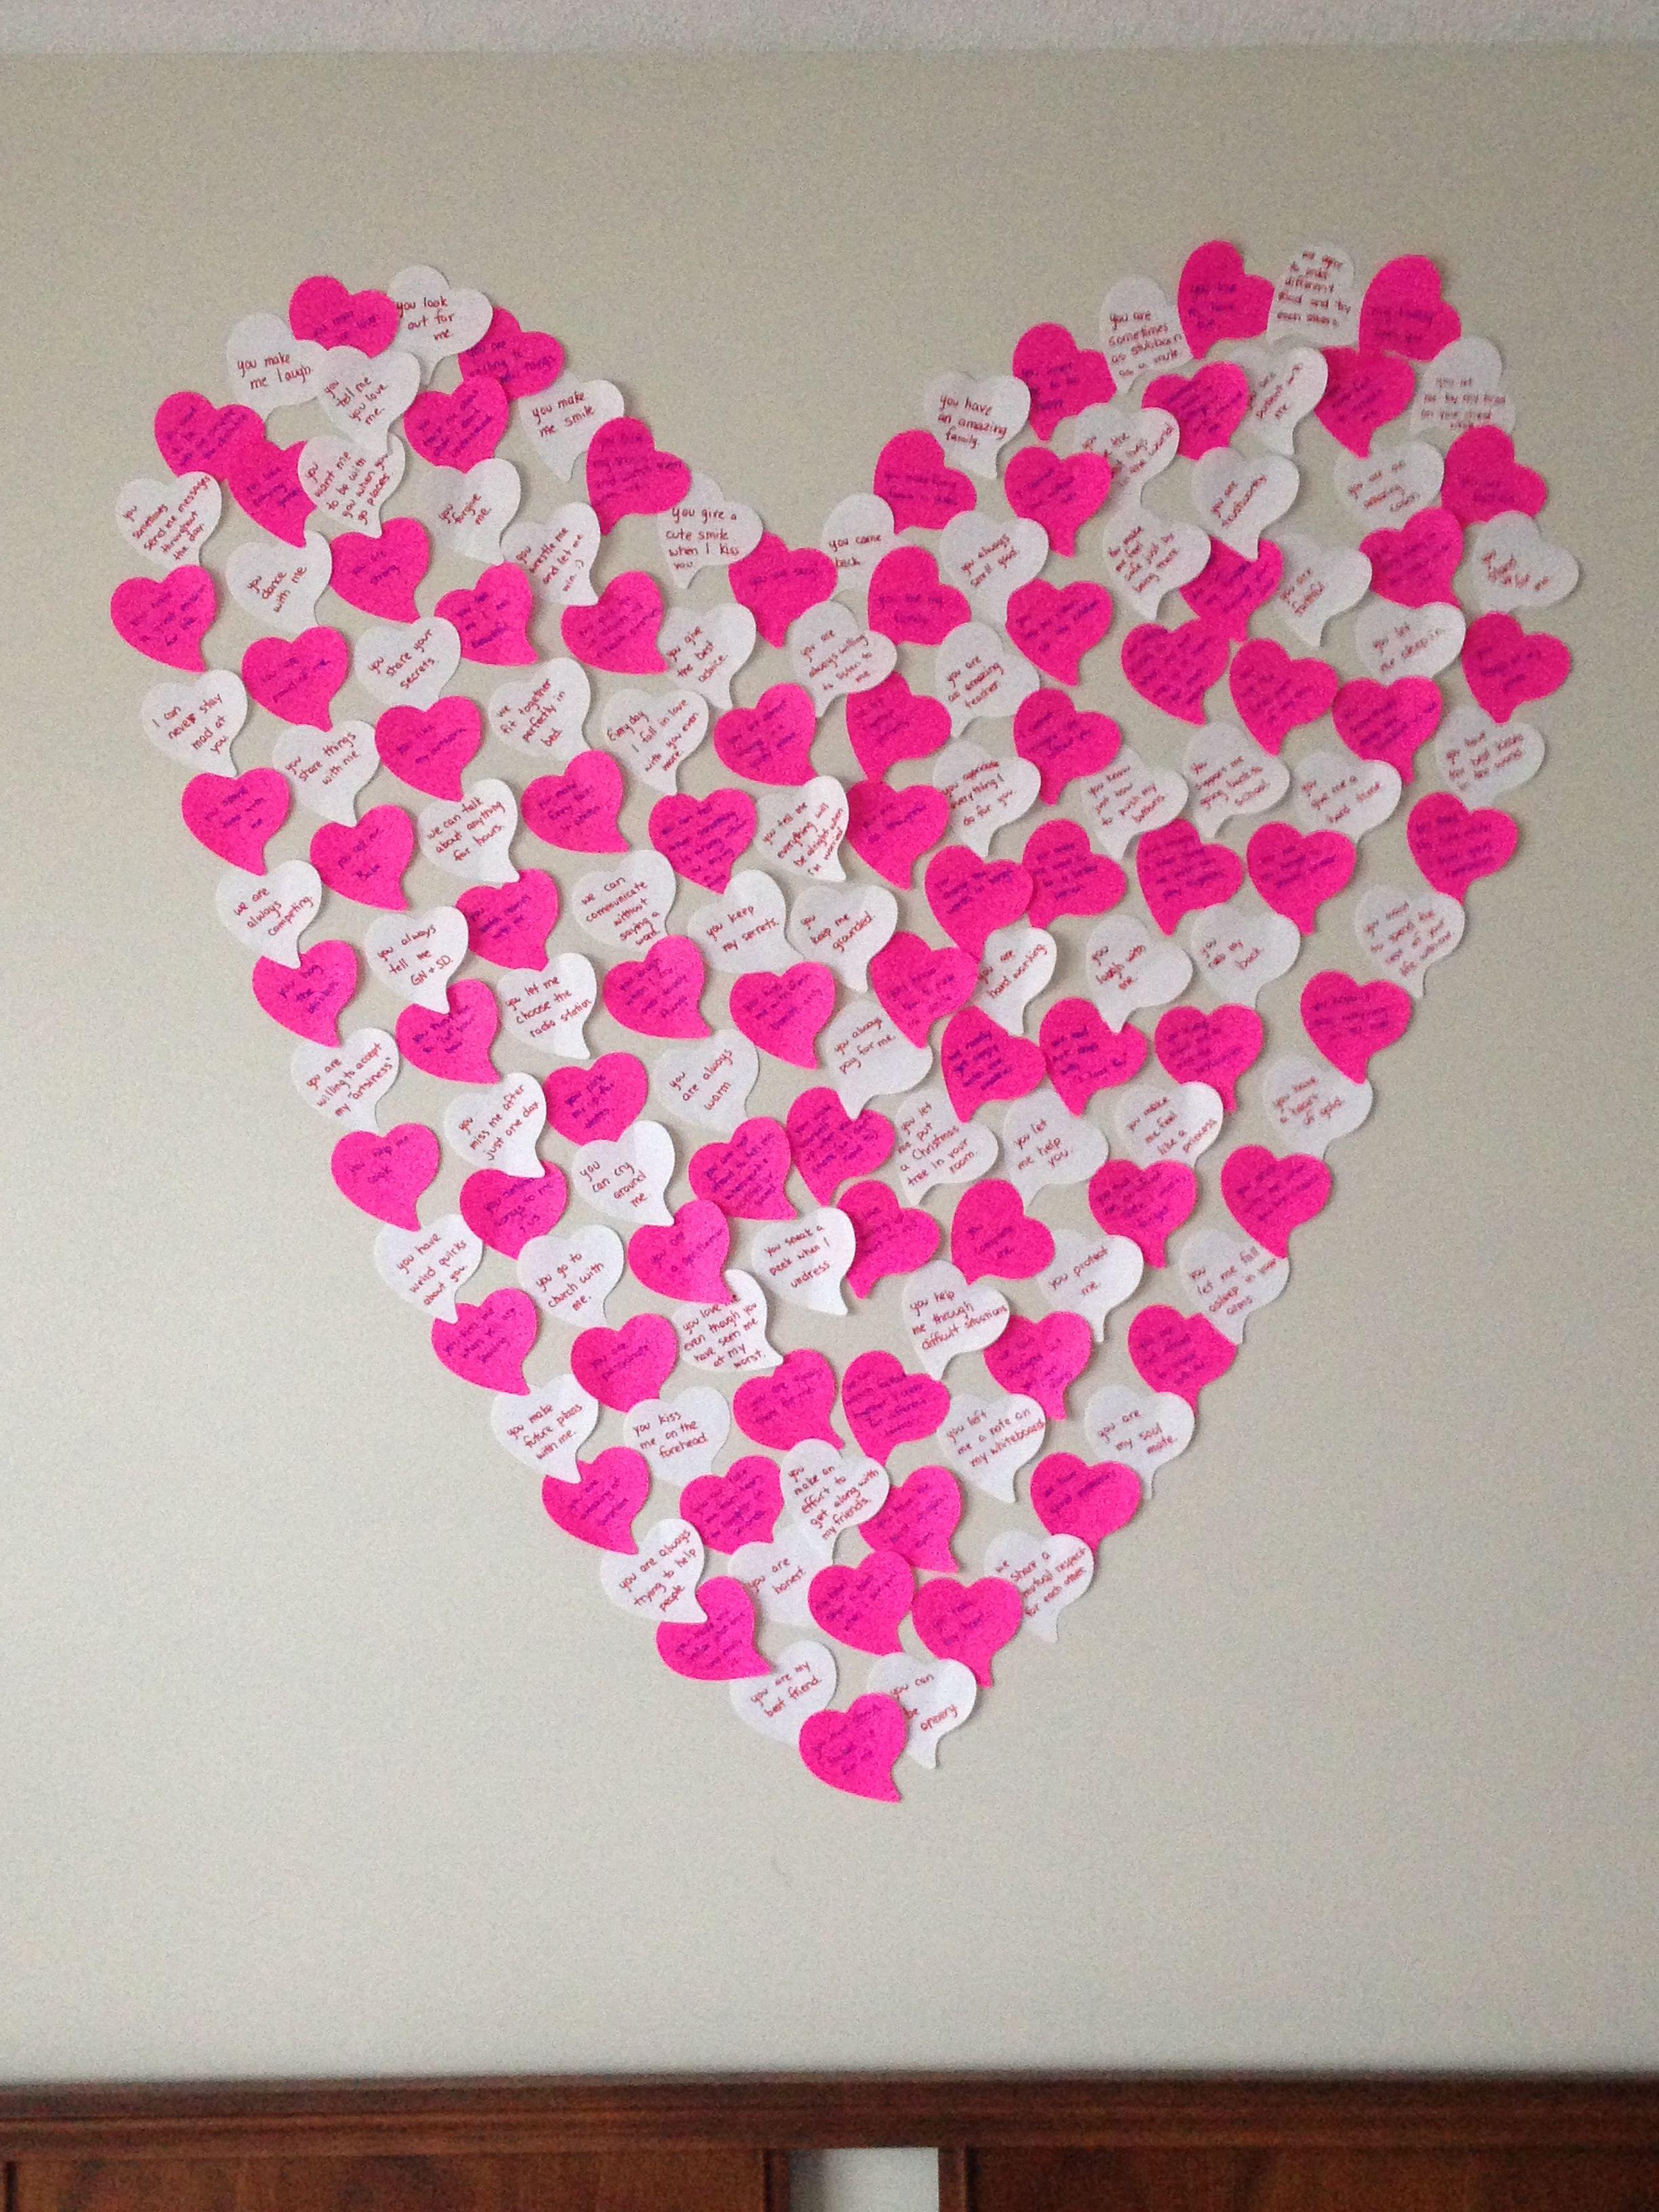 150 Reasons I Love My Boyfriend Used Heart Shaped